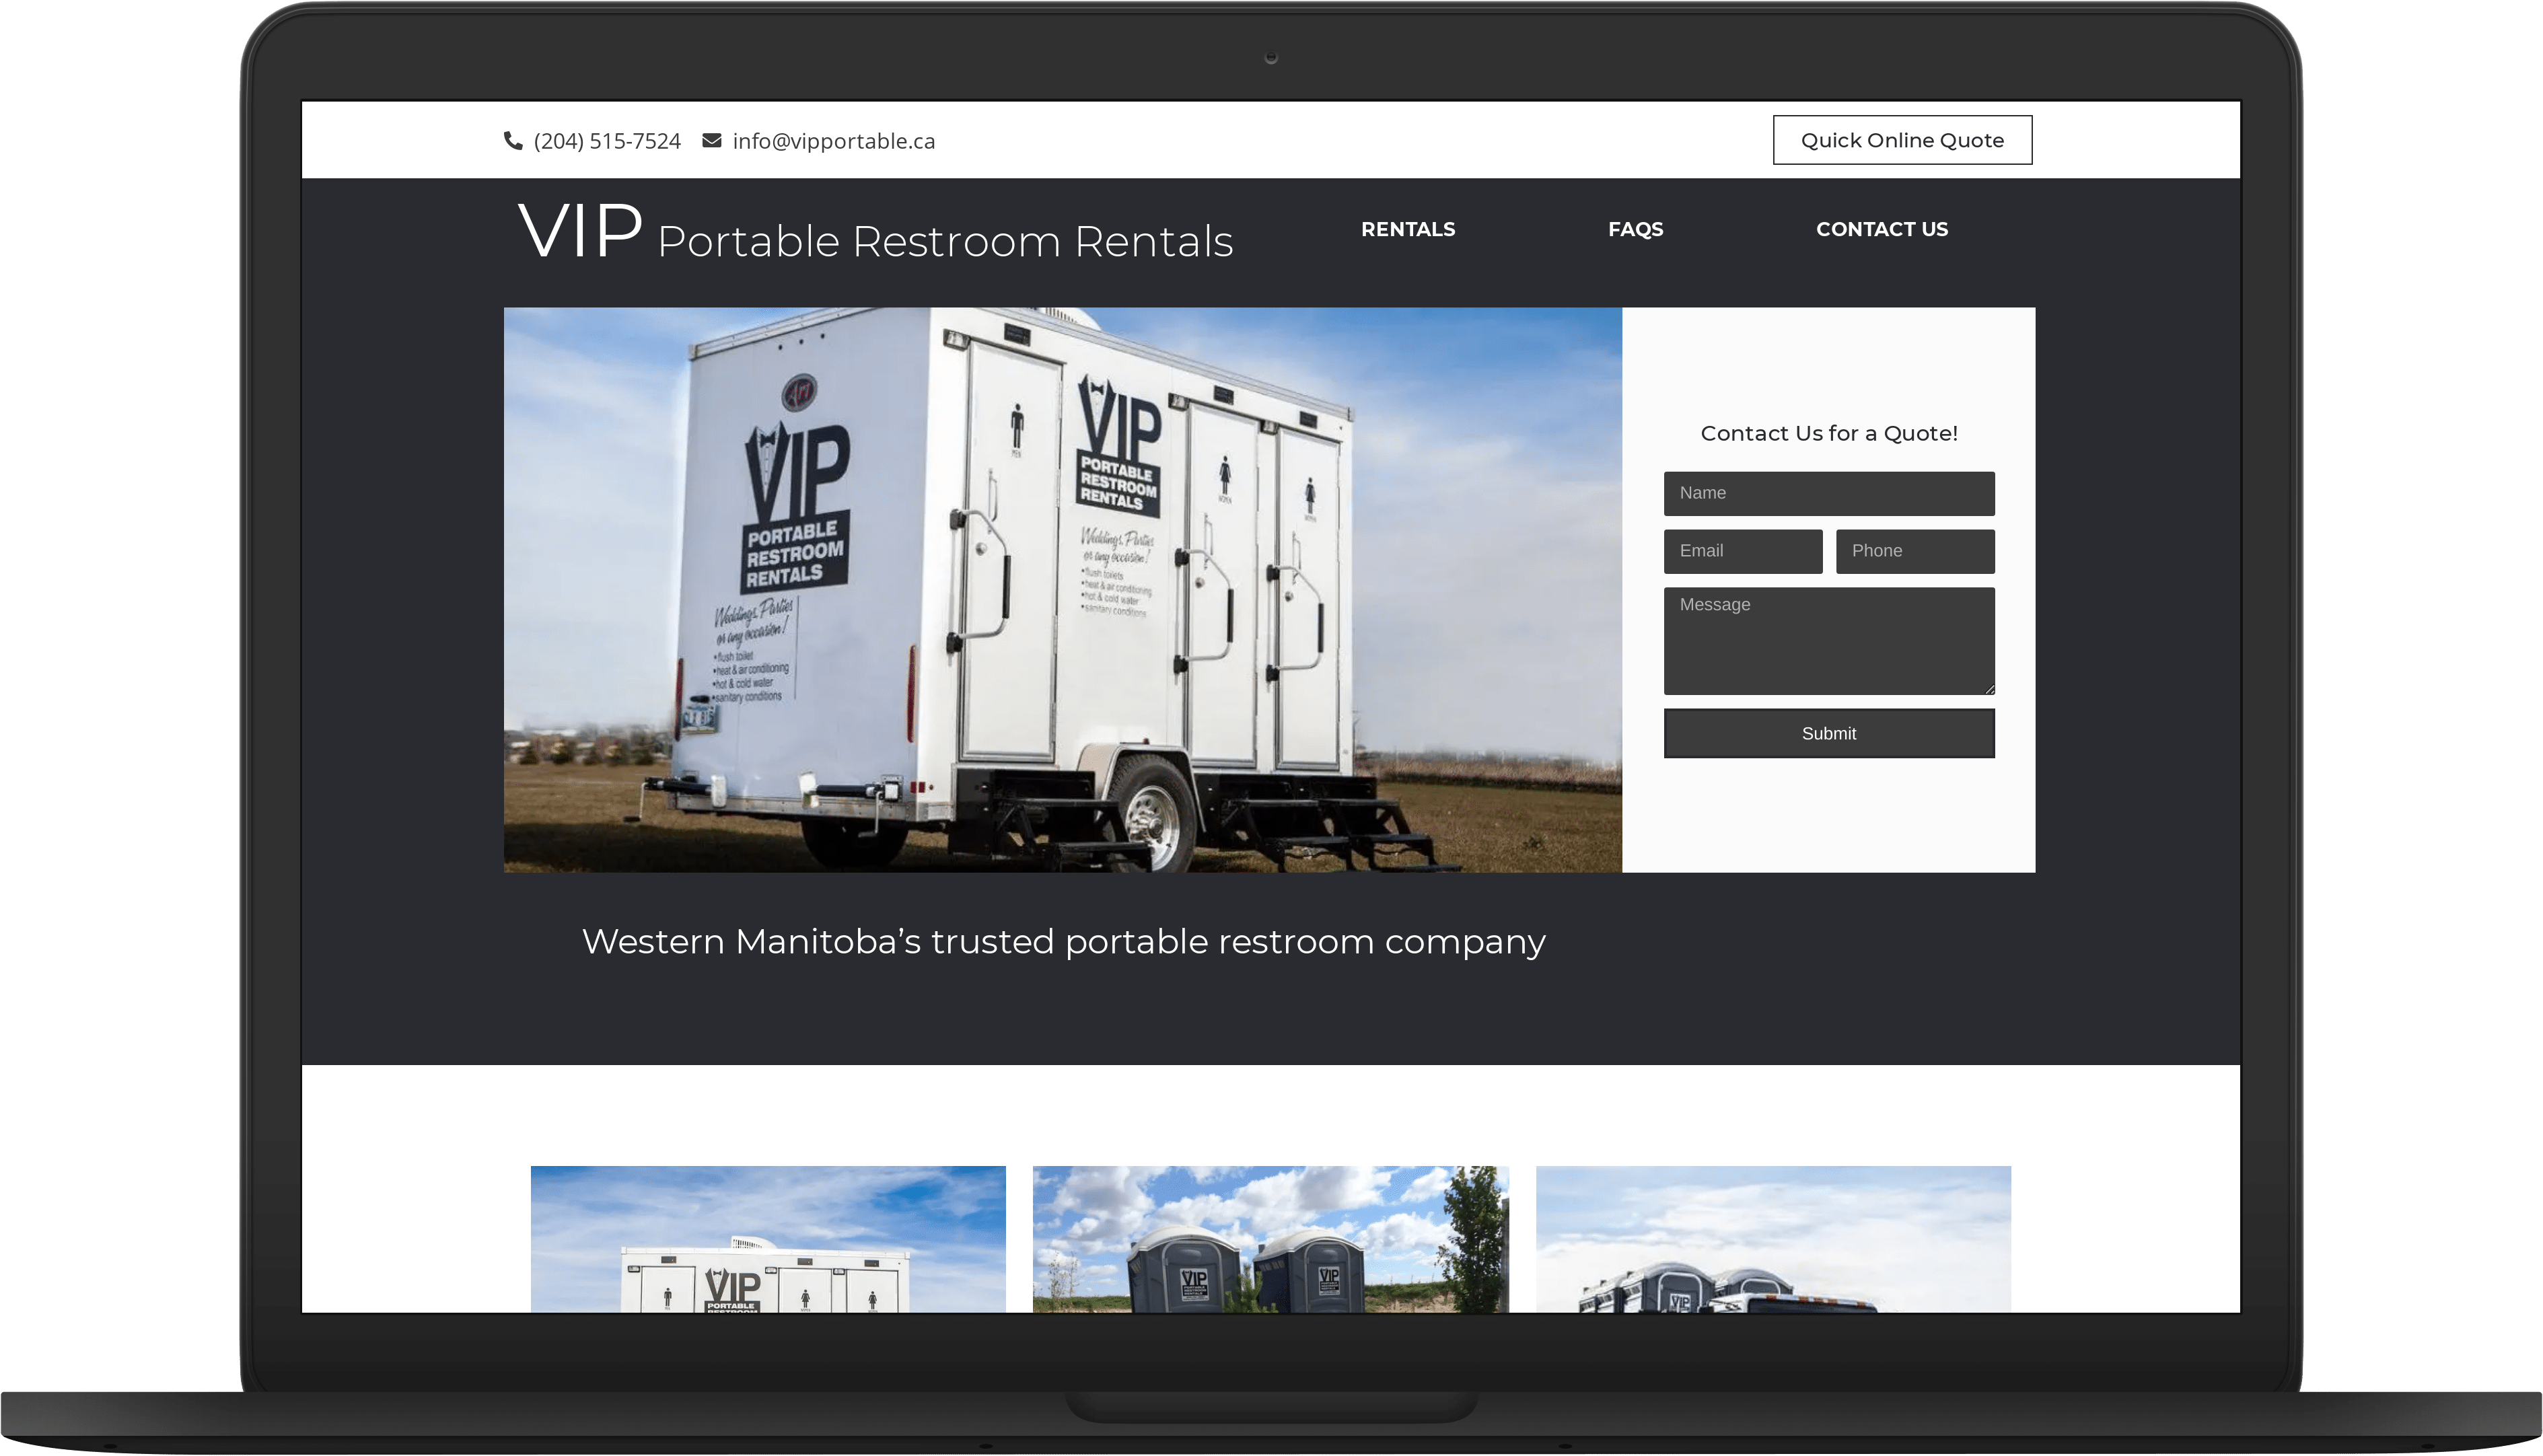 q49nlx vipportable ca SEO Services